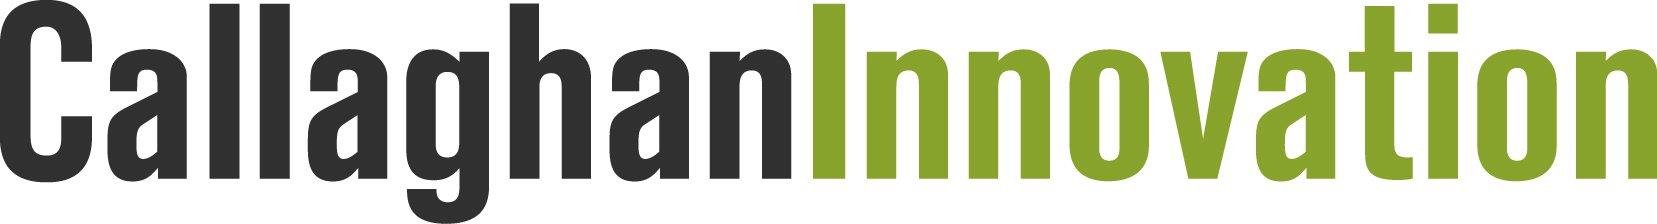 CallaghanInnovation_Logo.jpg